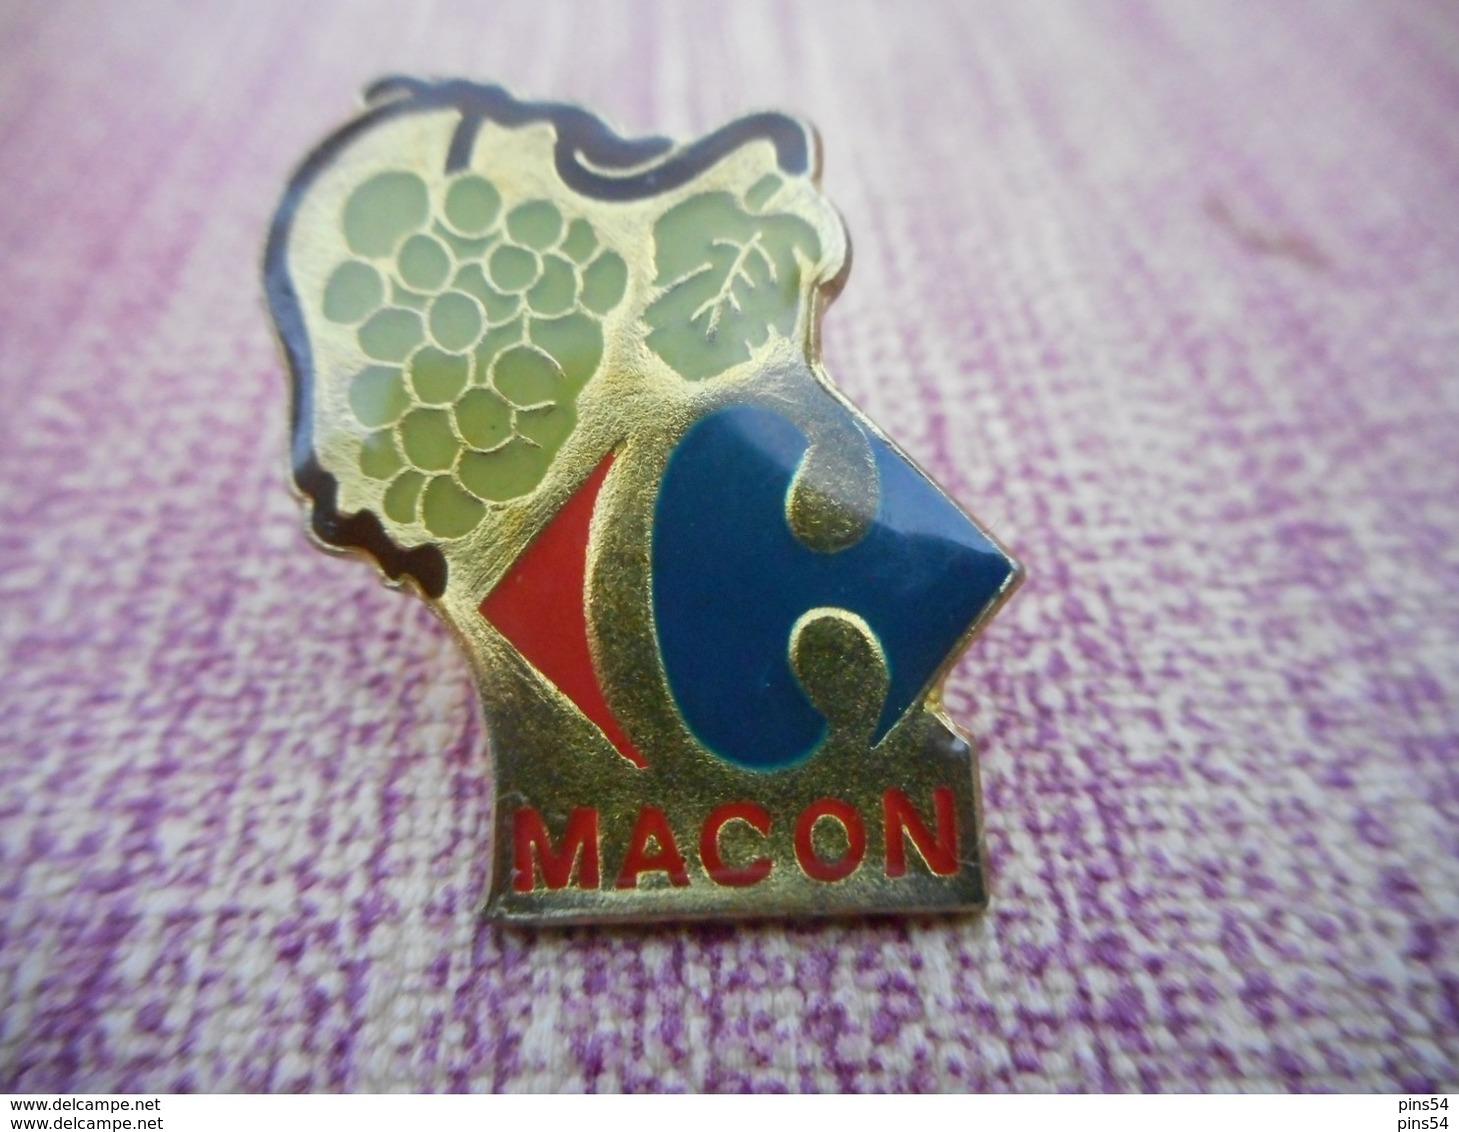 A008 -- Pin's Carrefour Macon - Merken